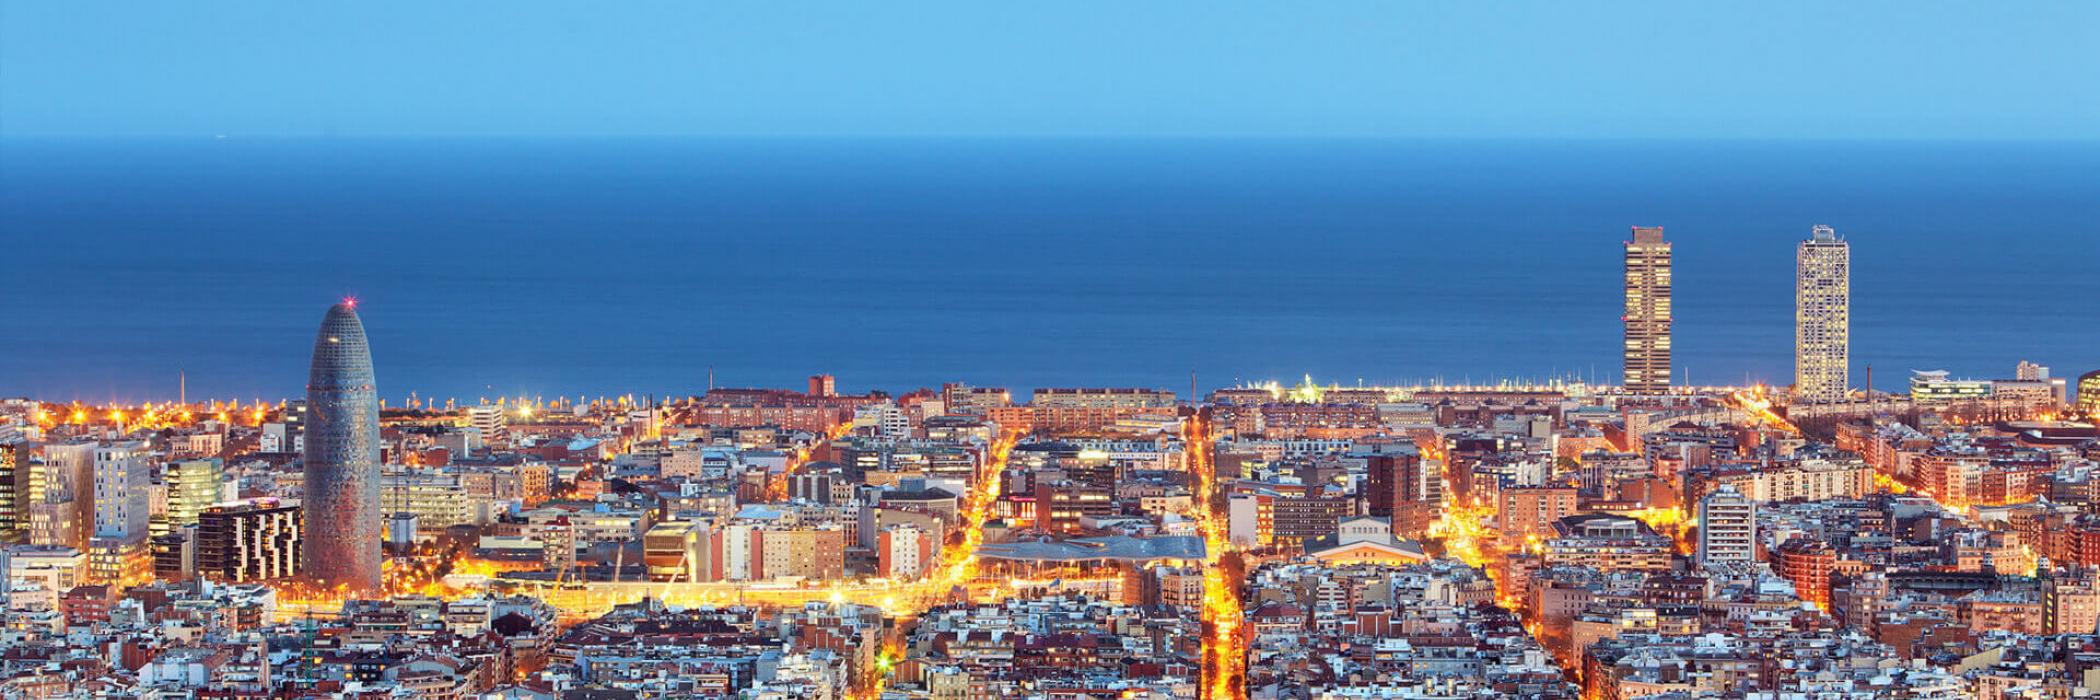 Barcelons skylight